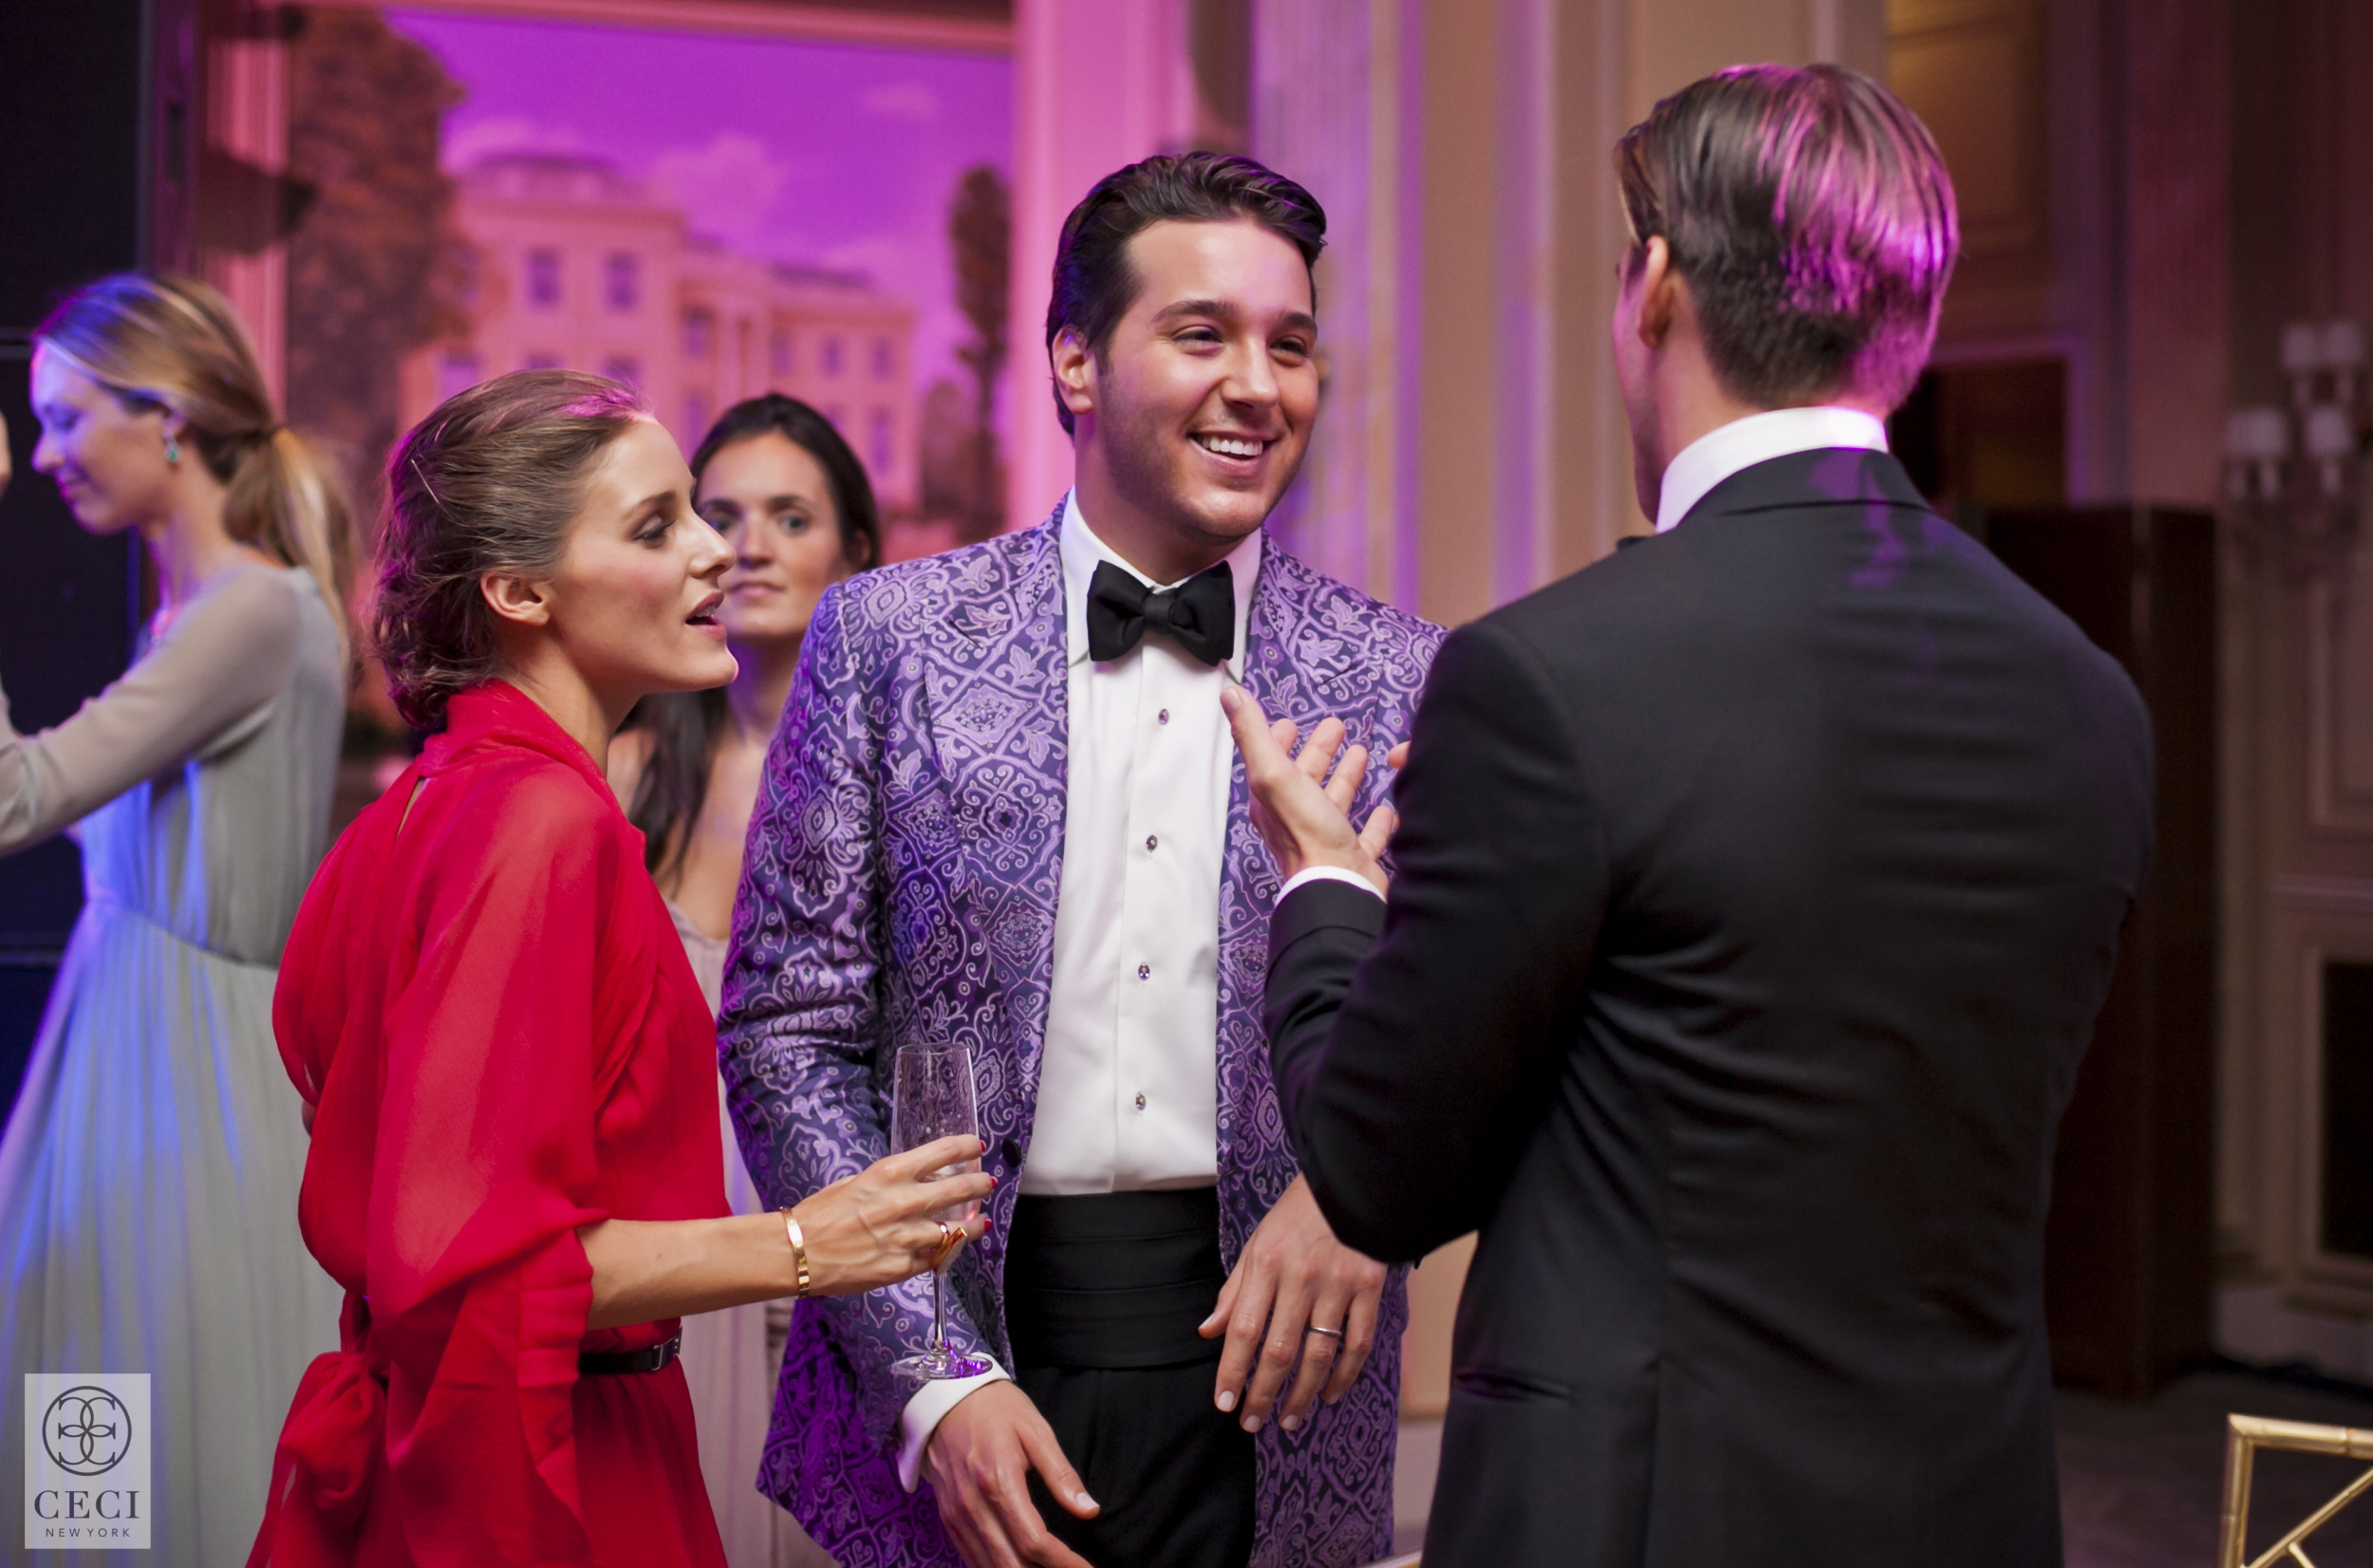 ceci_new_york_lucas_somoza_purple_regal_wediding_birthday_commitment_ceremony_gold-48.jpg